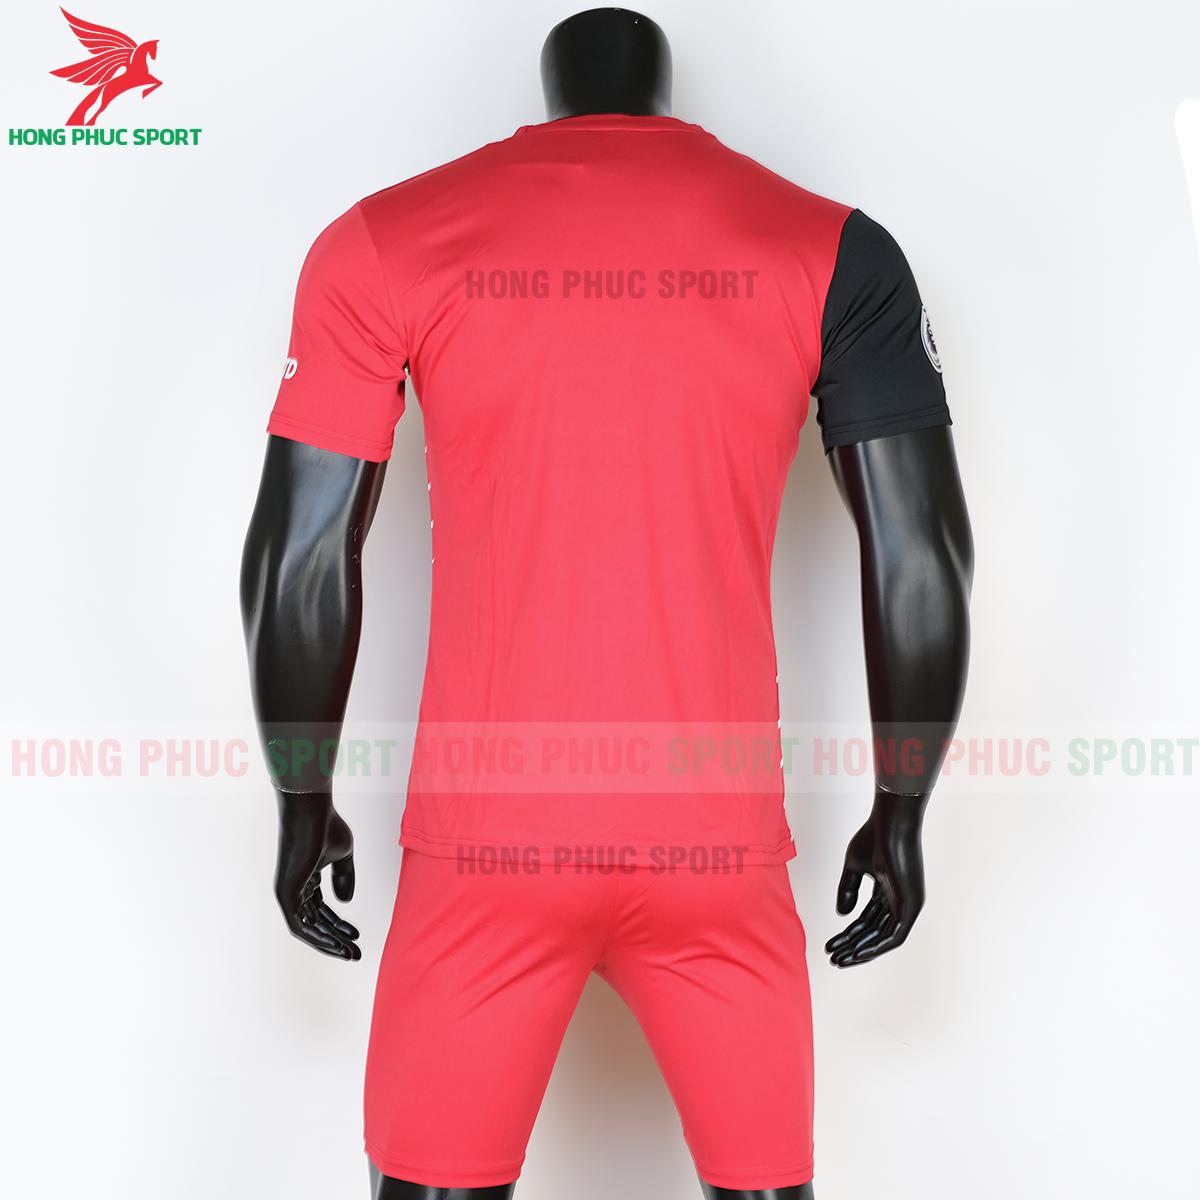 https://cdn.hongphucsport.com/unsafe/s4.shopbay.vn/files/285/ao-bong-da-manchester-united-2020-2021-phien-ban-fan-sau-5f6c0e3f27fb4.png